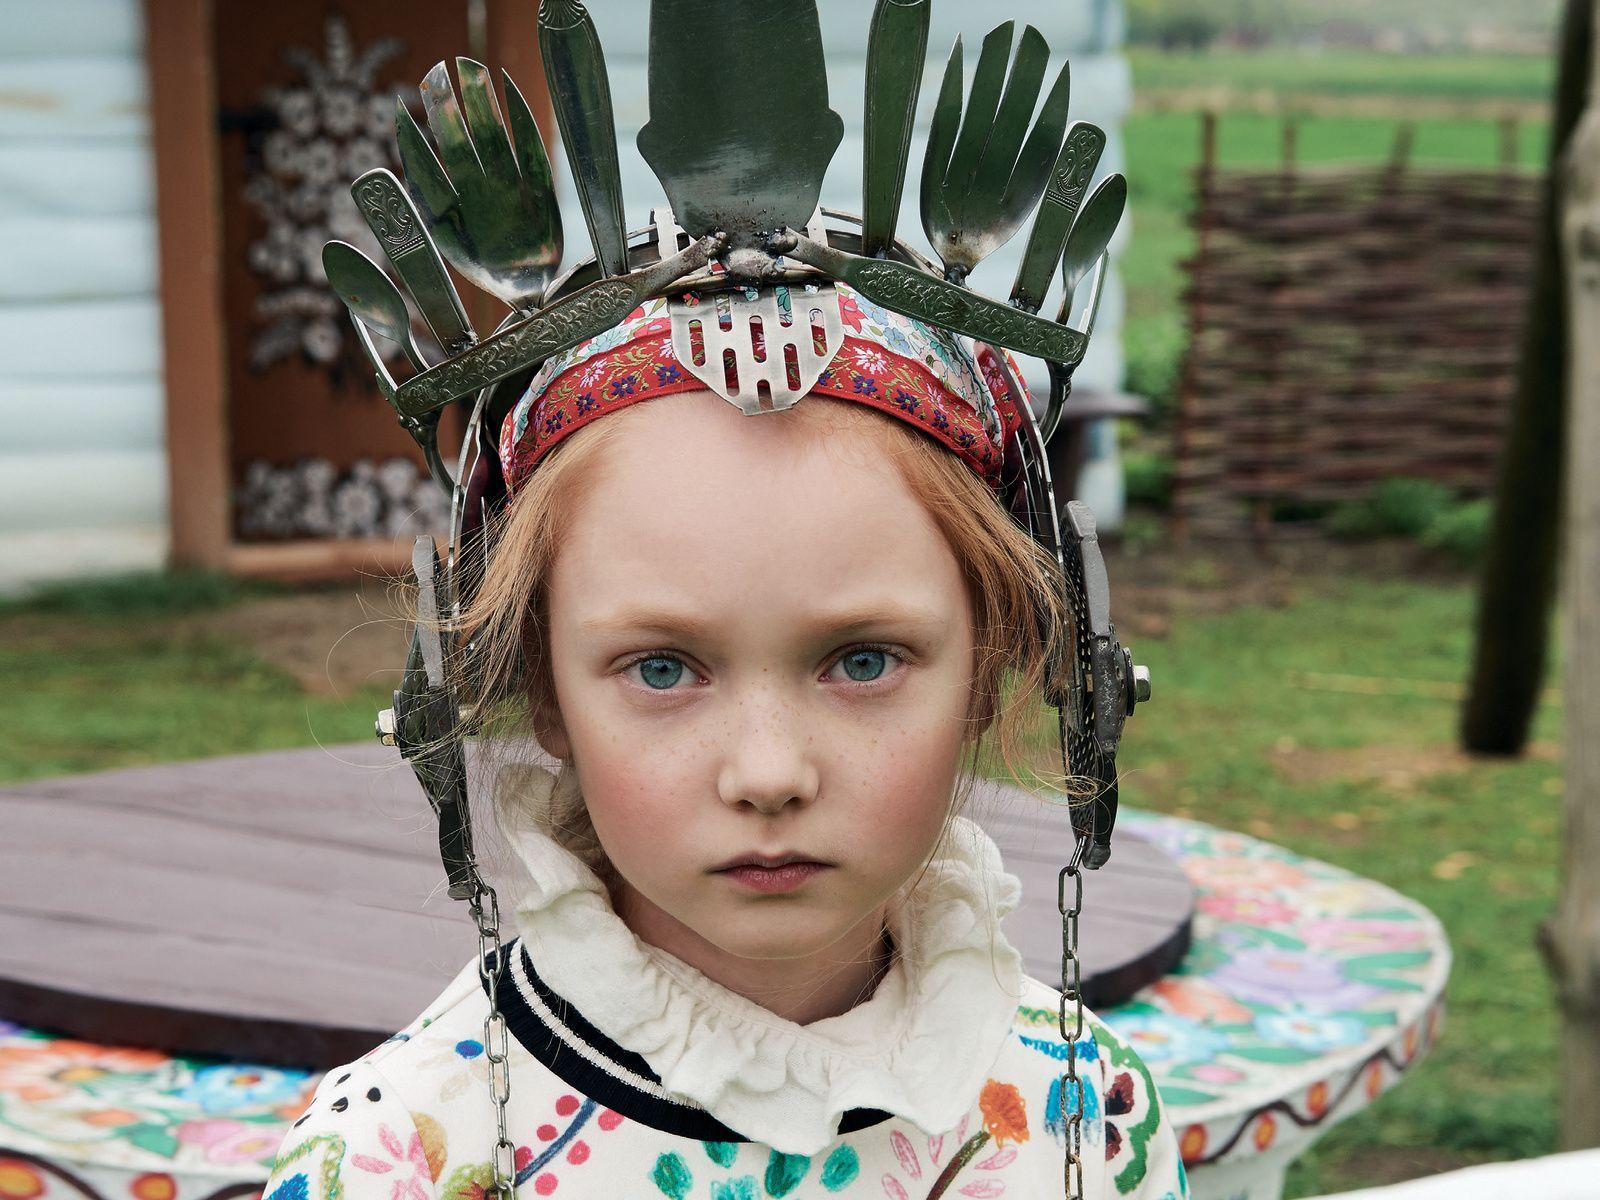 Sfondi bambini ~ Vogue bambini ph. marco tassinari styled by simona valentini